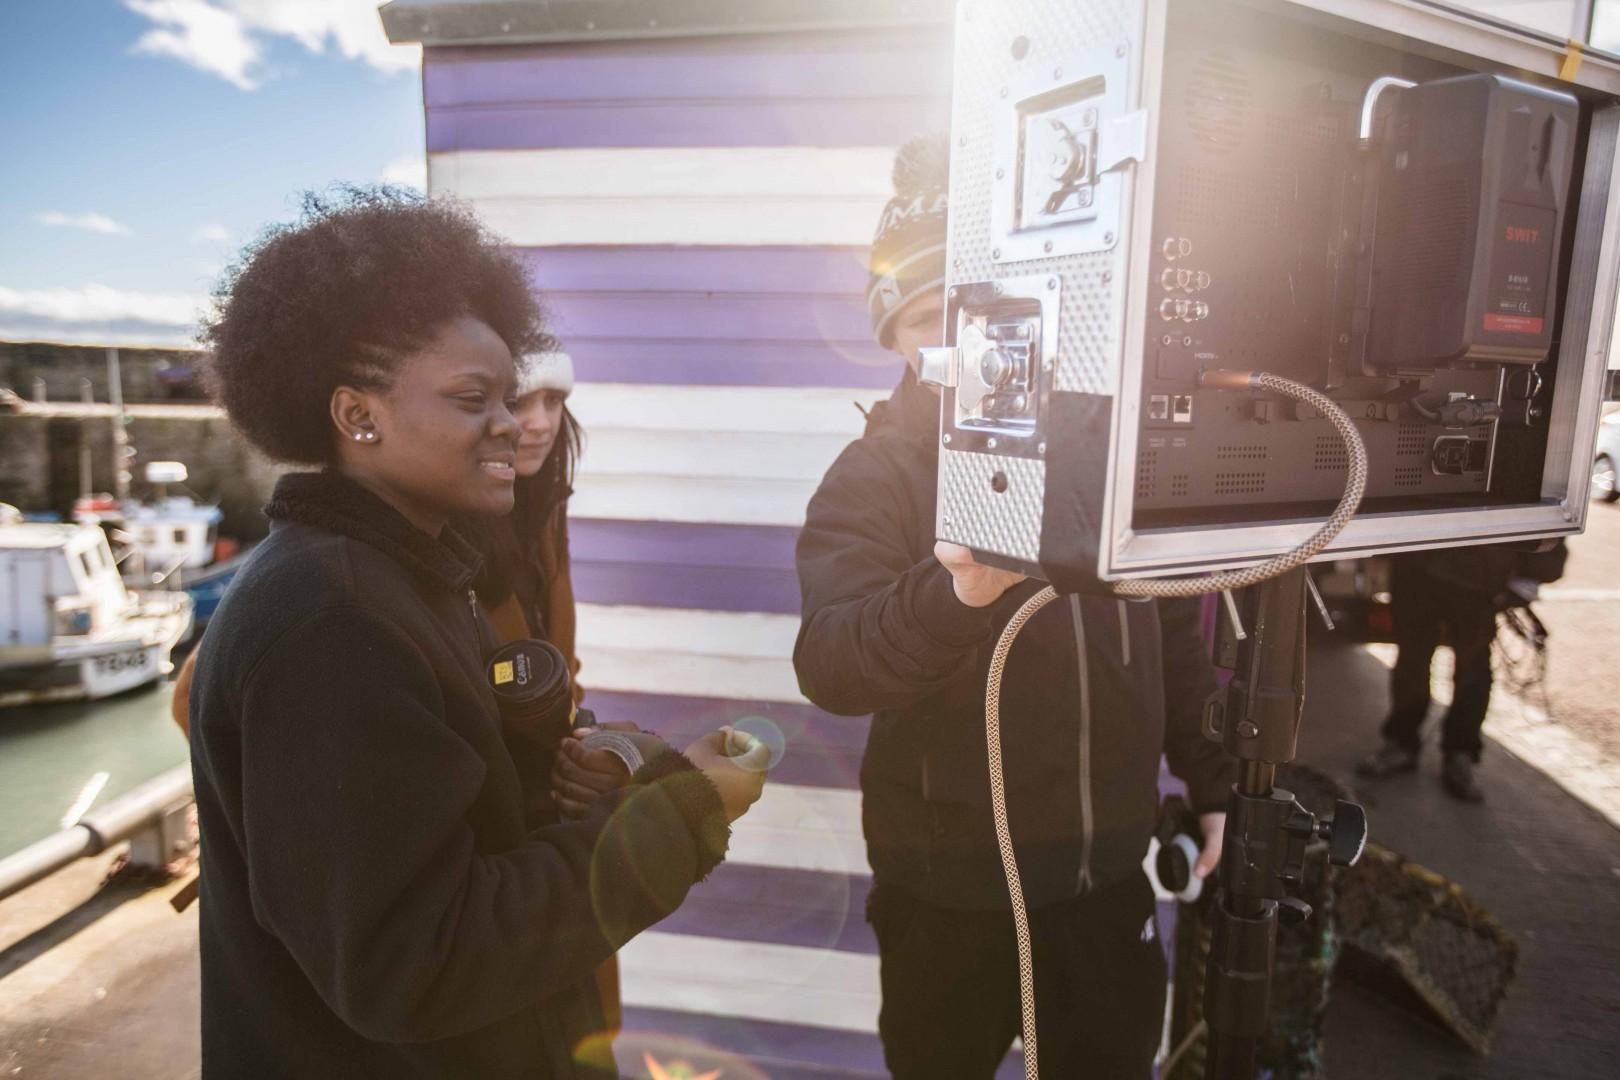 Audition Preparation: Film Image